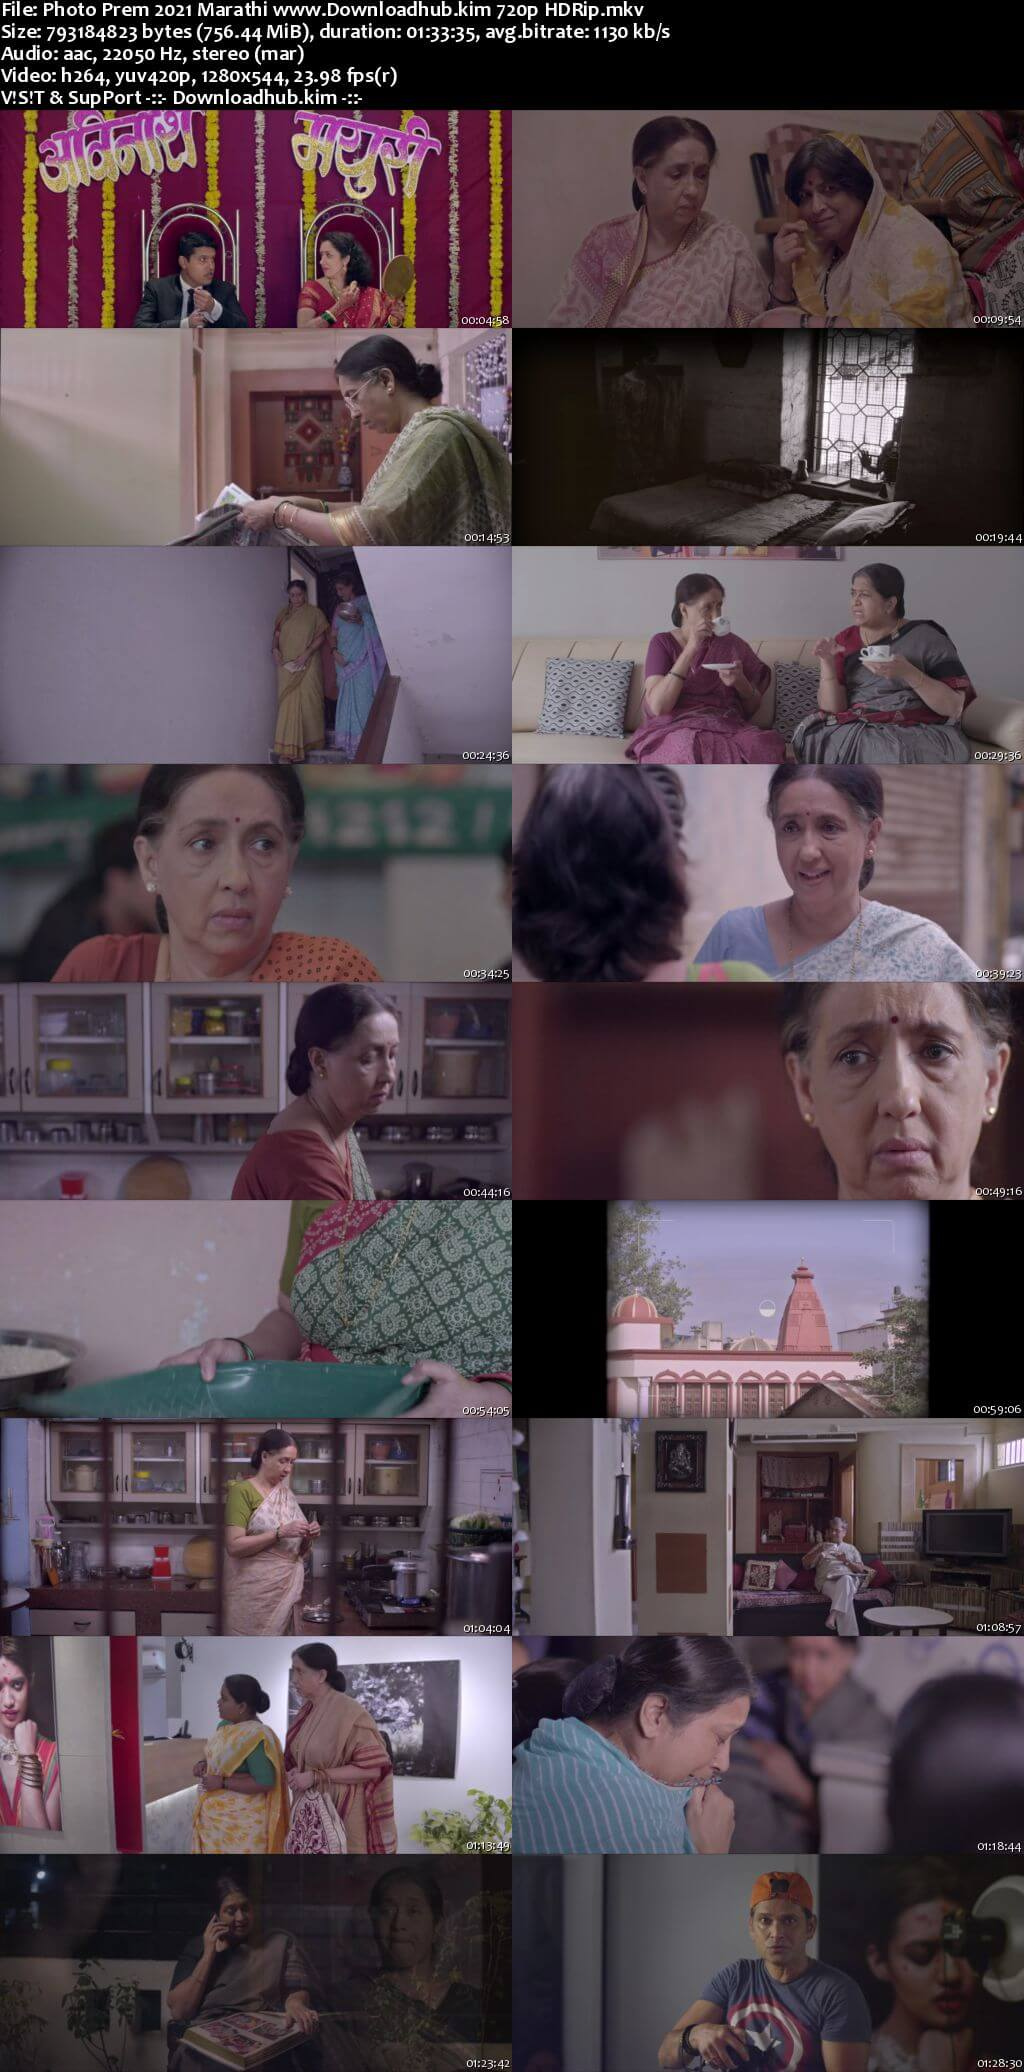 Photo Prem 2021 Marathi 720p HDRip ESubs